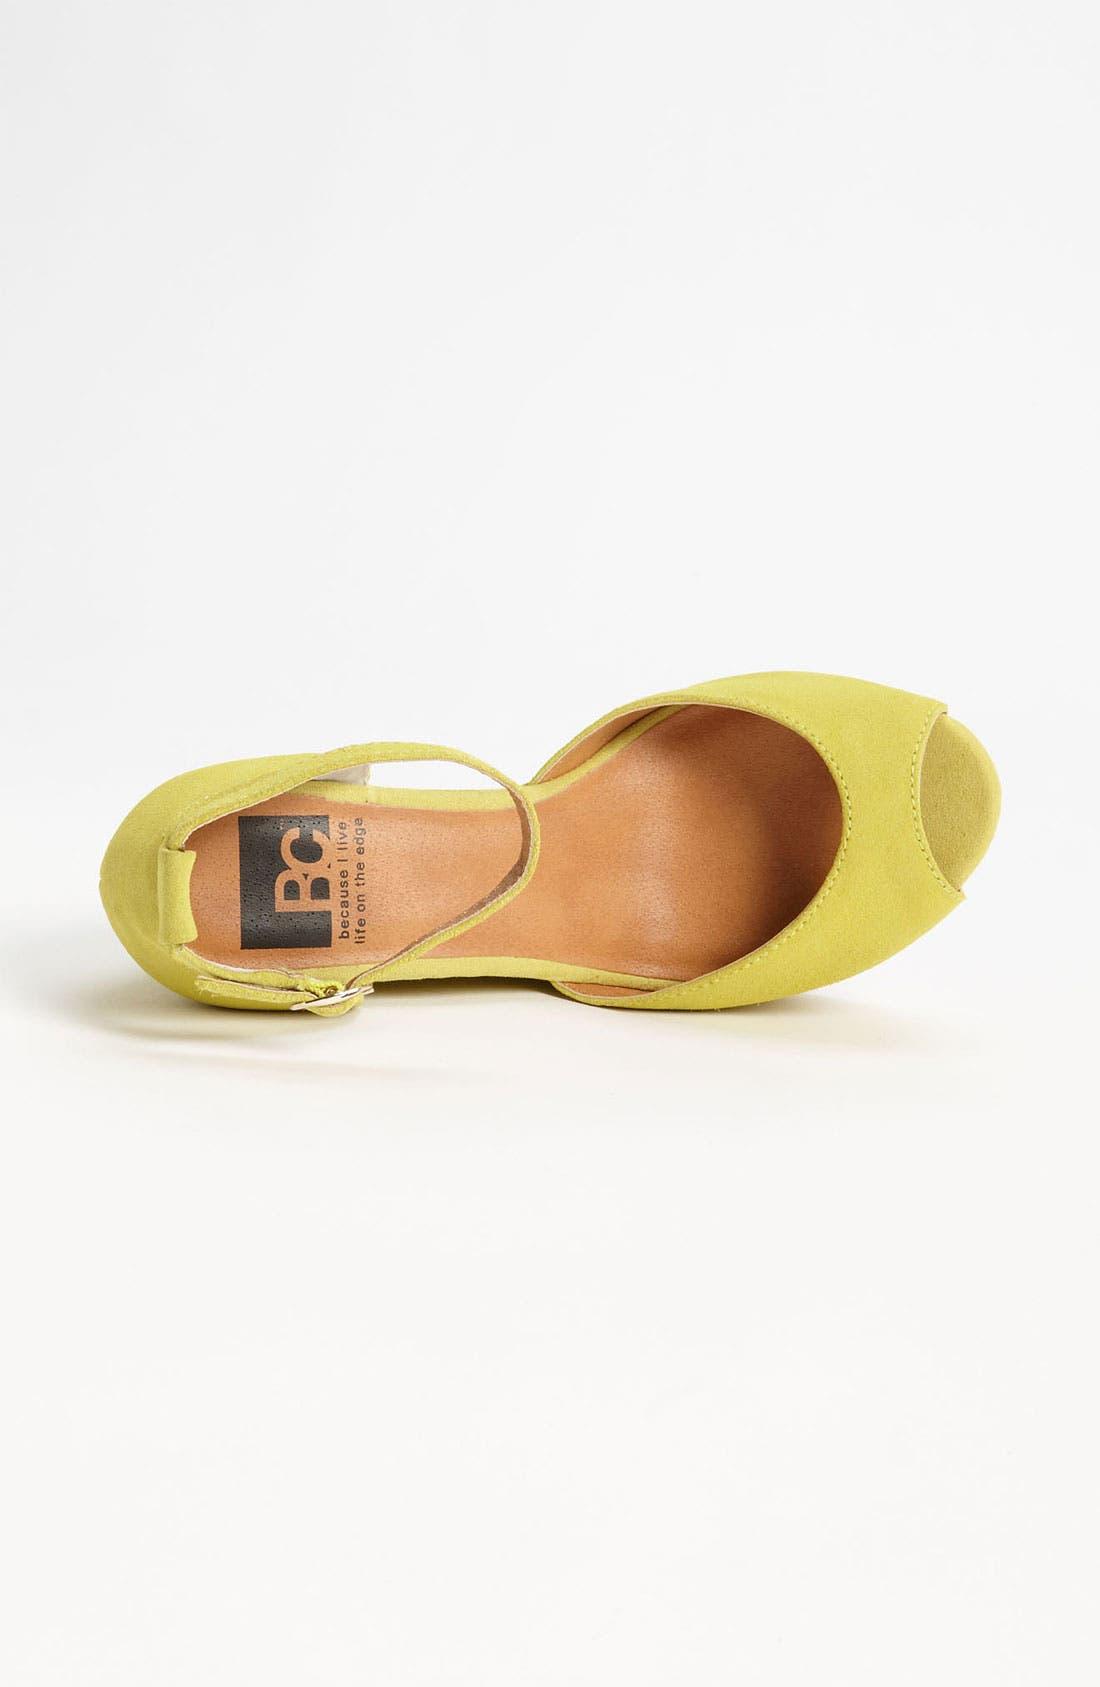 Alternate Image 3  - BC Footwear 'Bright Idea' Wedge Sandal